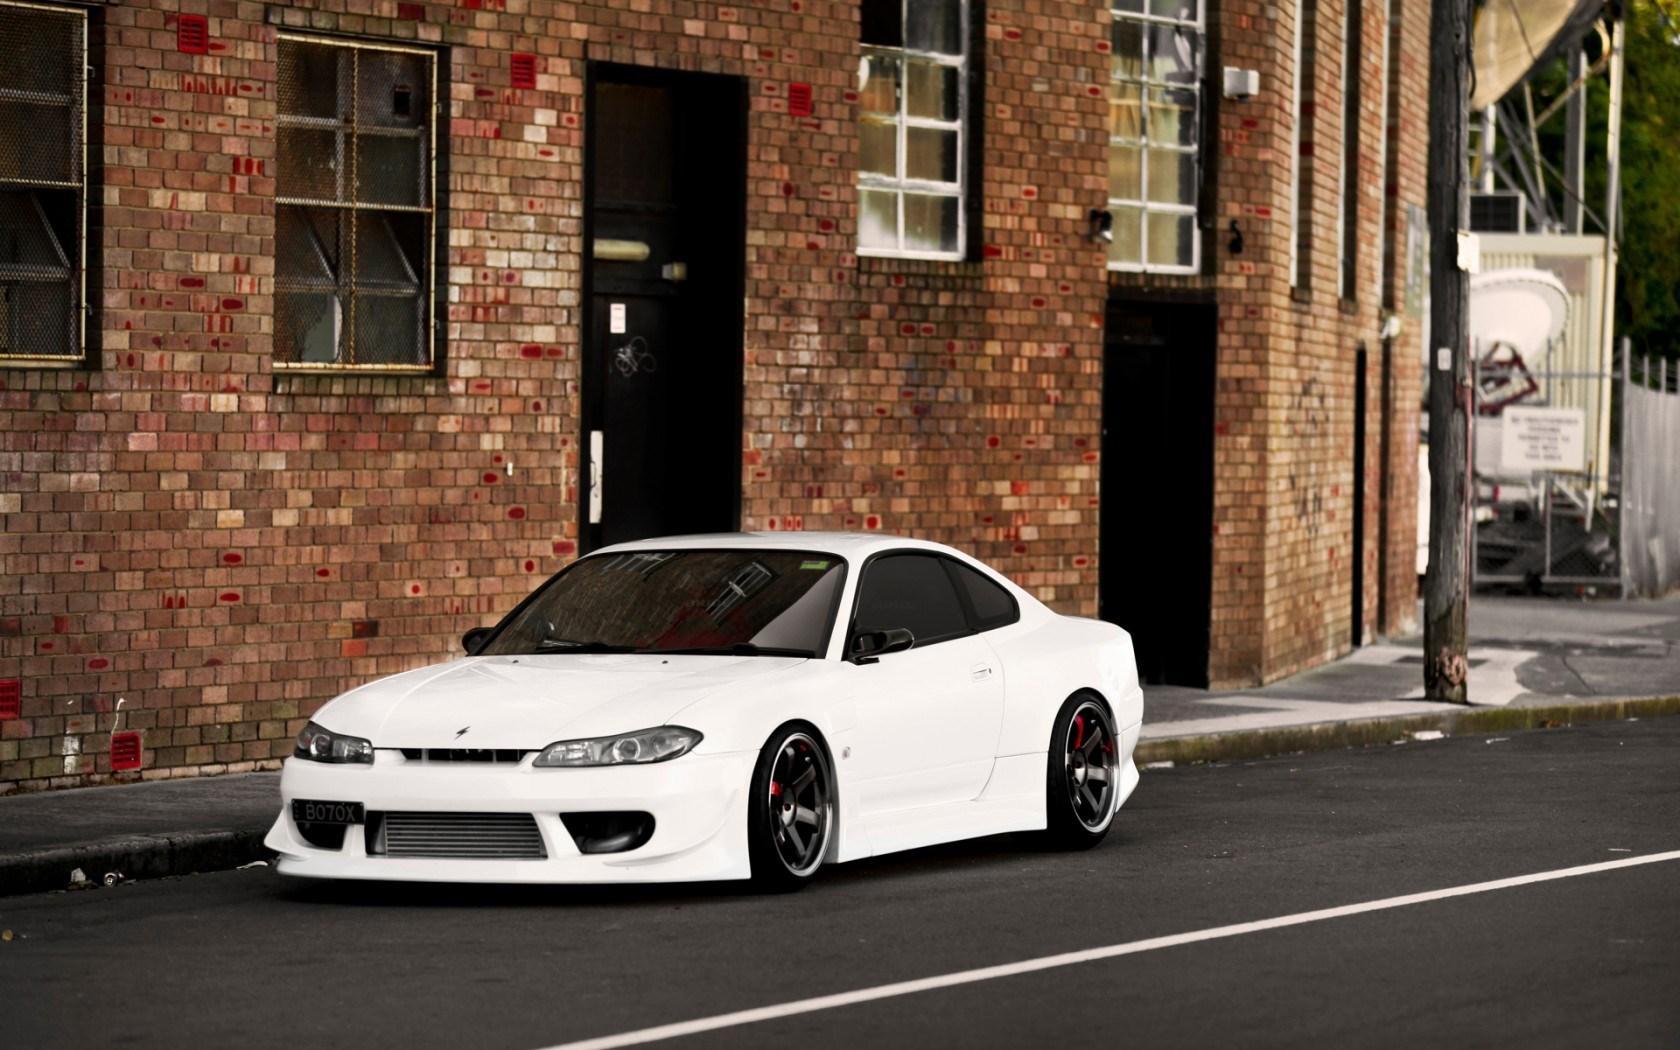 Nissan Silvia S15 Car Tuning Street